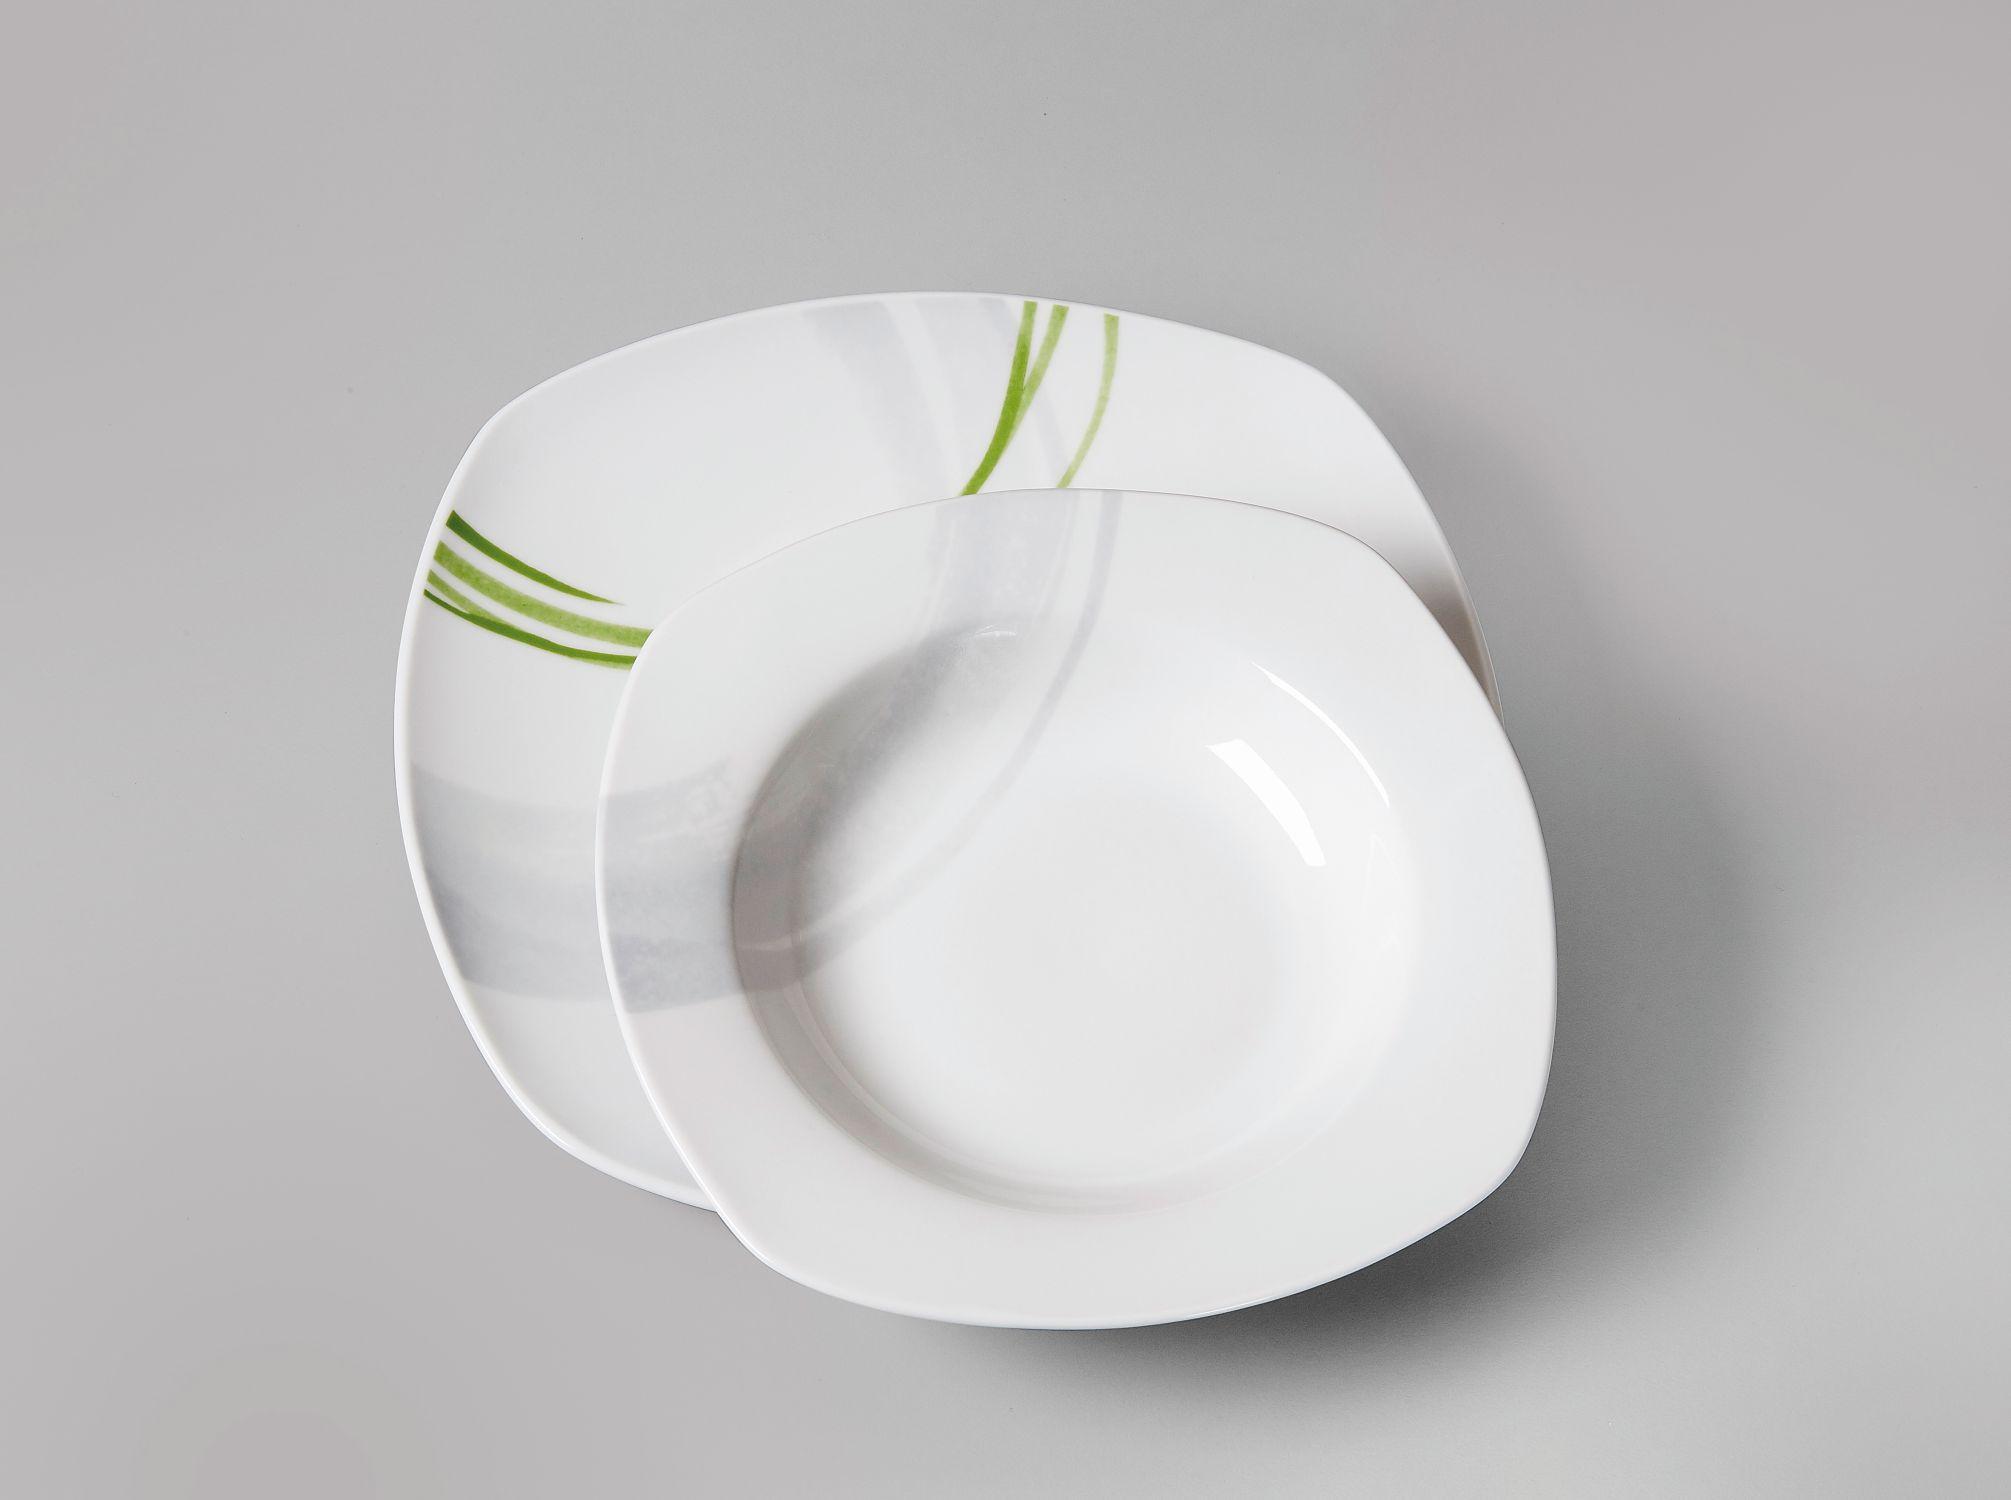 ritzenhoff und breker tafelservice flirt porzellan serie palma 12 tlg neu gastro. Black Bedroom Furniture Sets. Home Design Ideas